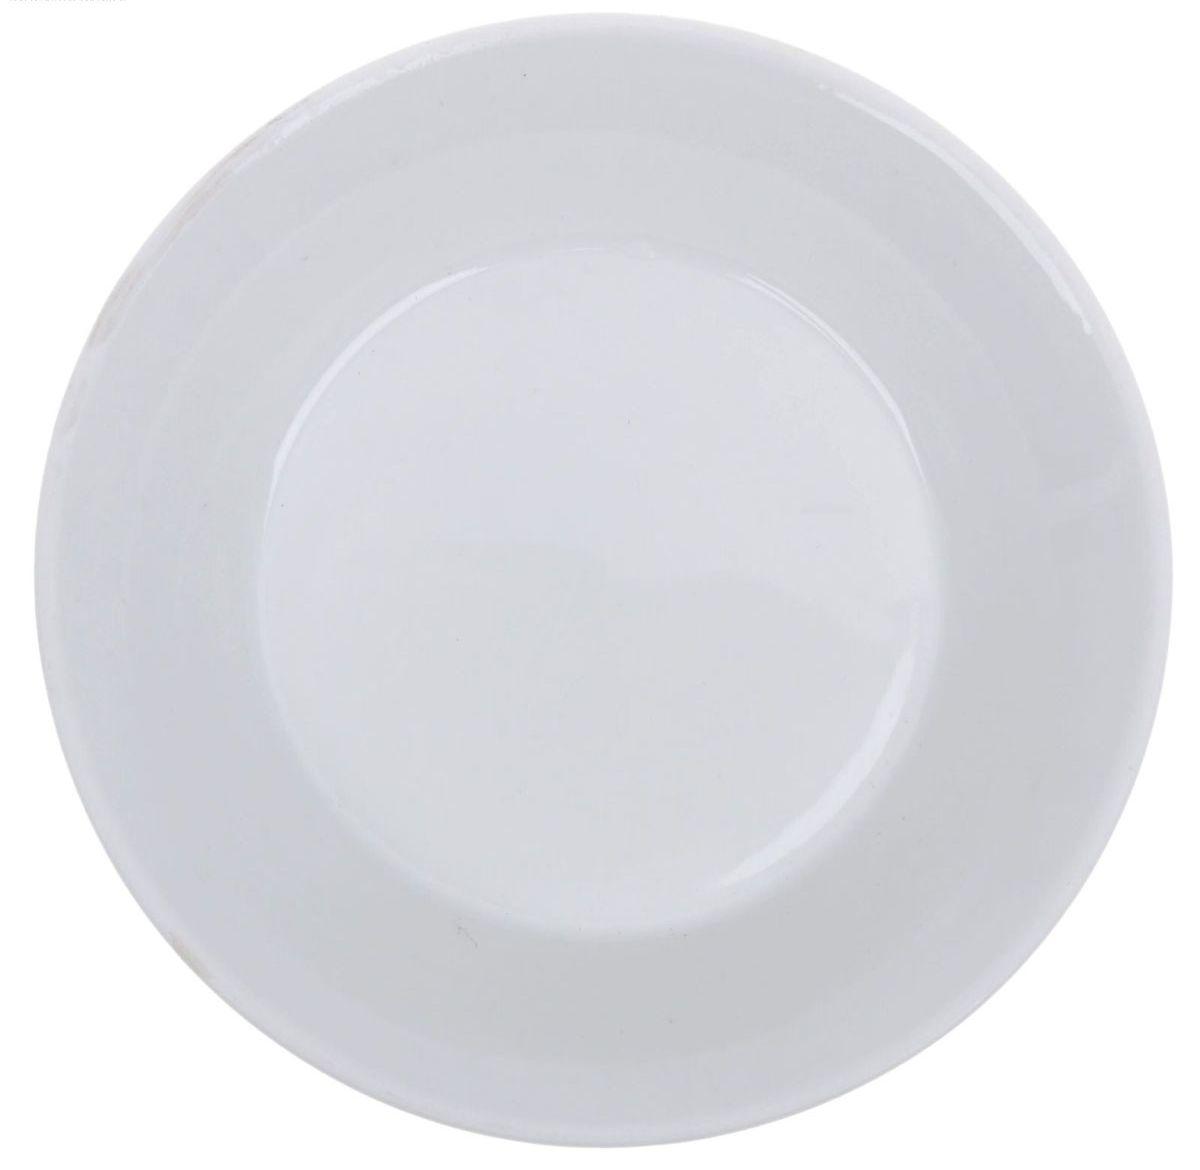 Блюдце Белье, диаметр 14 см0С0450